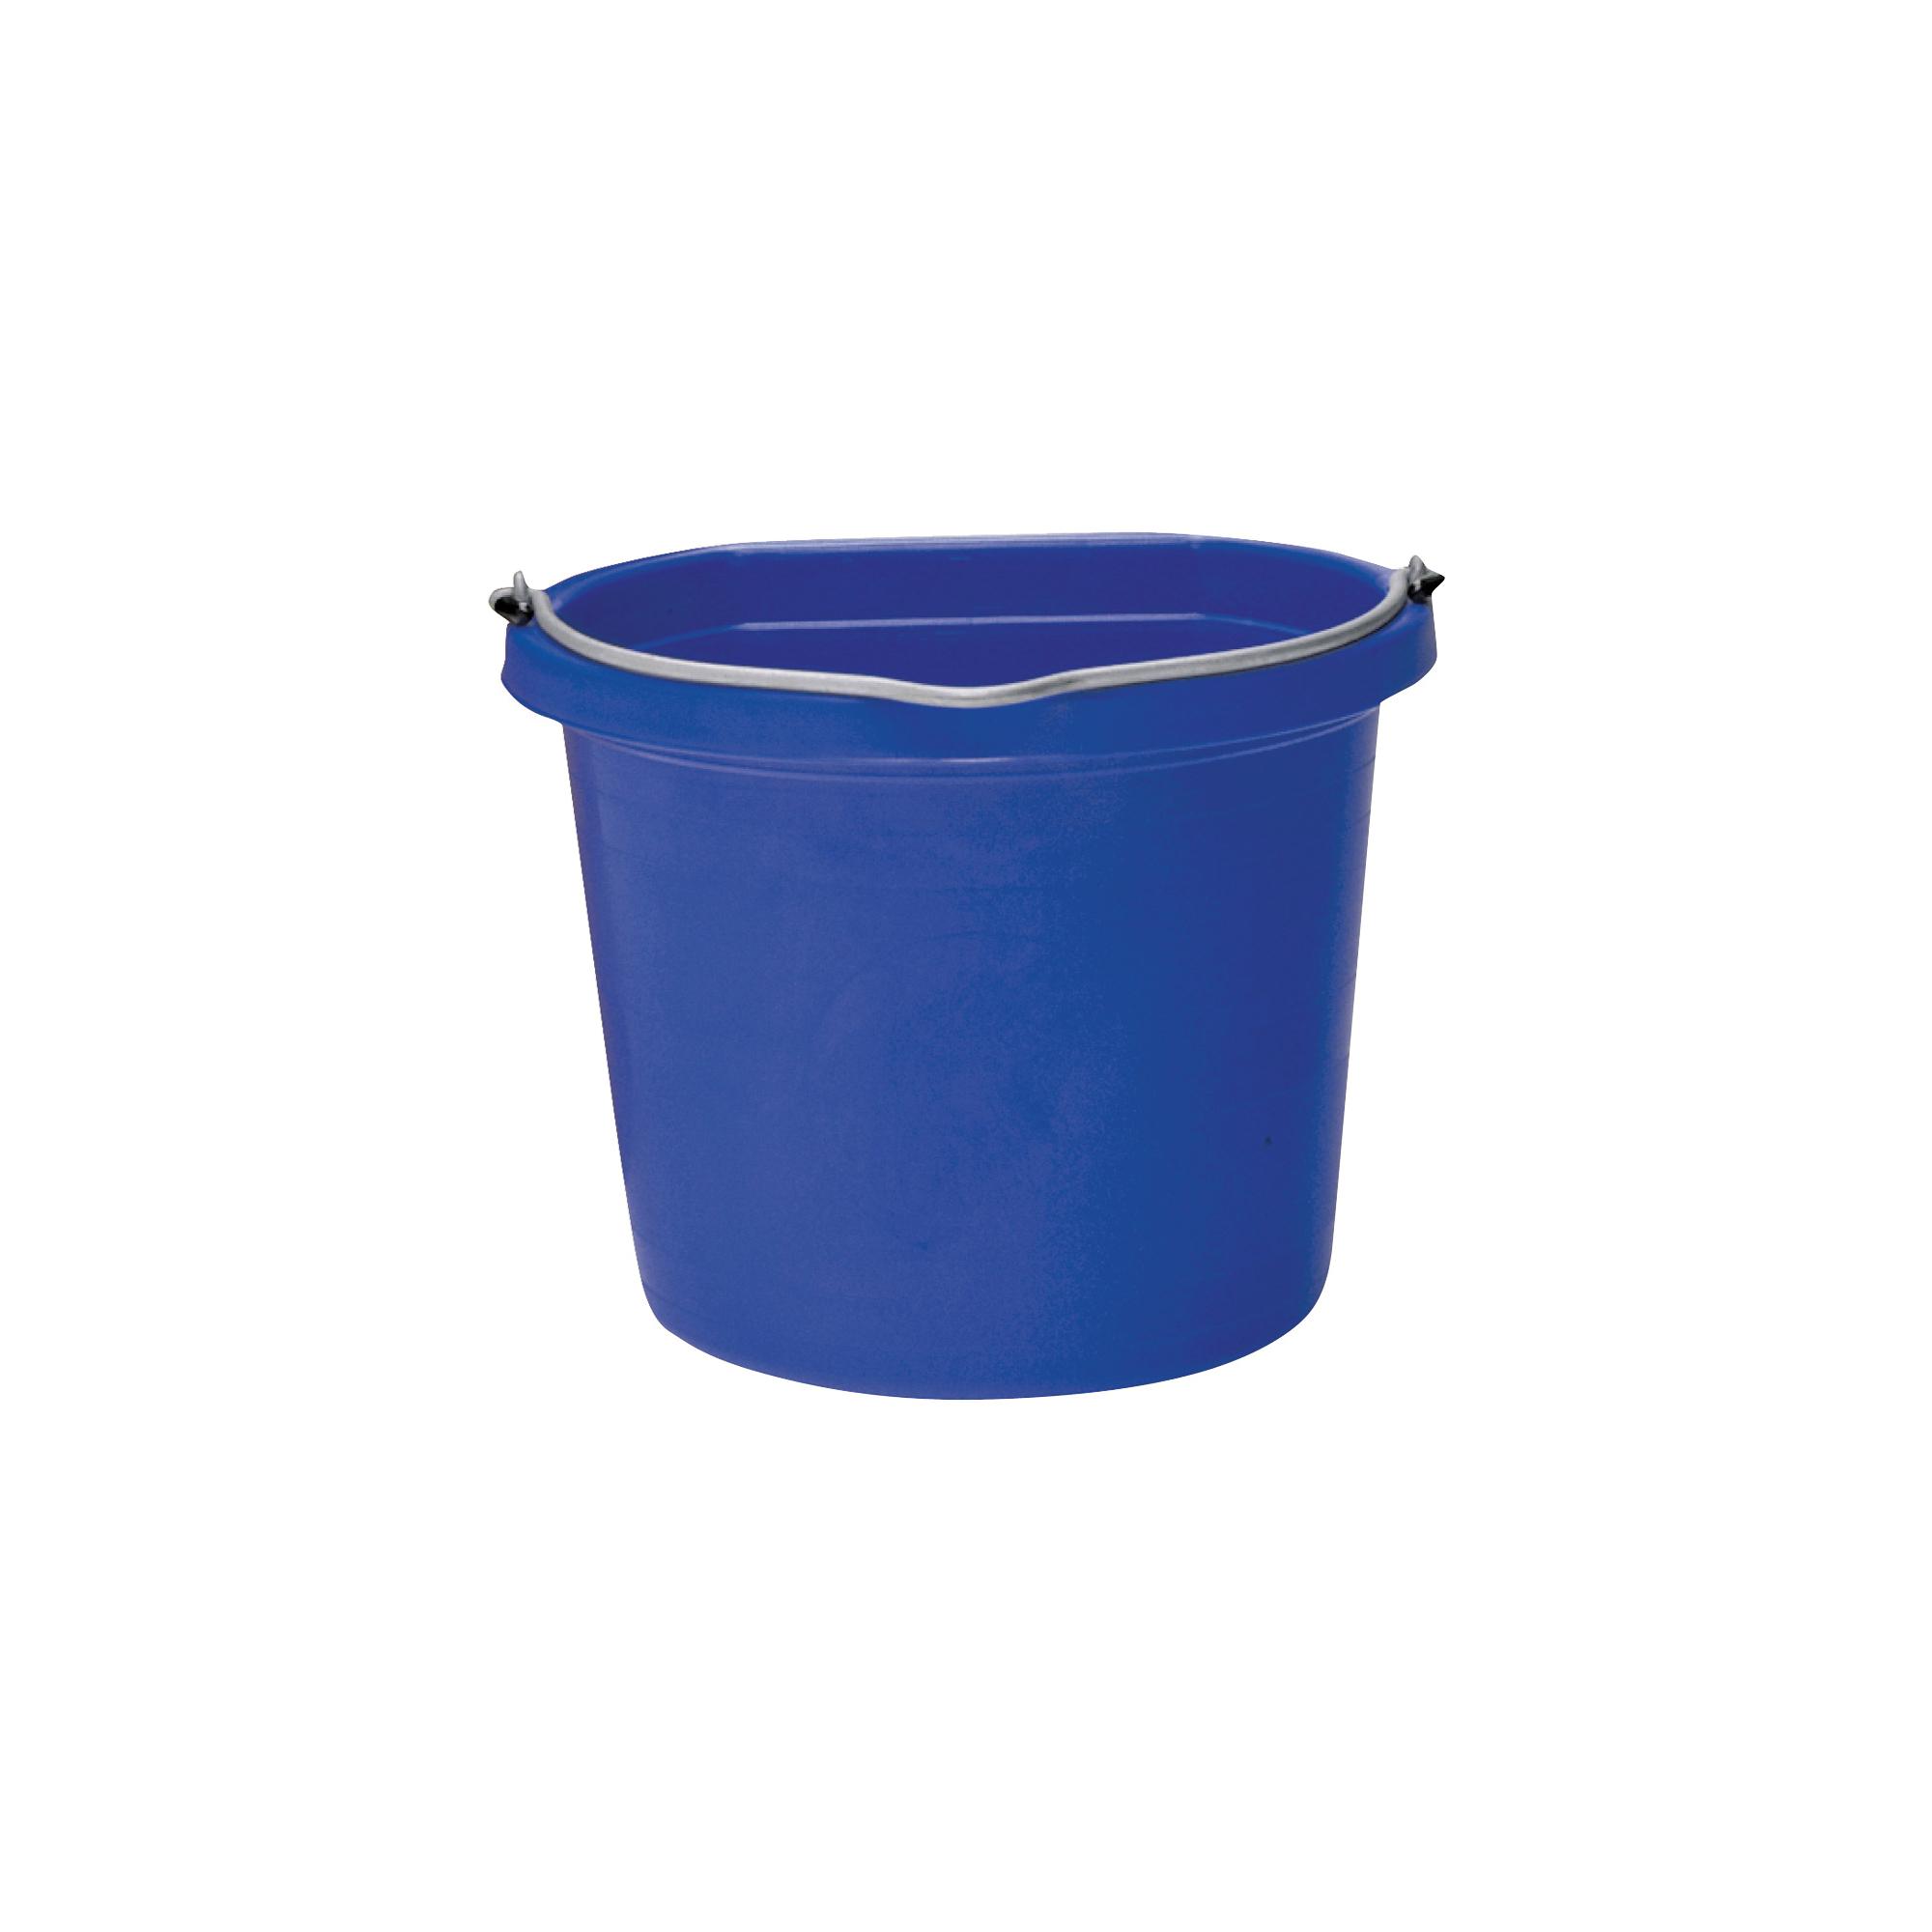 Picture of FORTEX-FORTIFLEX FB-108 FB-108BL Bucket, 8 qt Volume, Rubber/Polyethylene, Blue